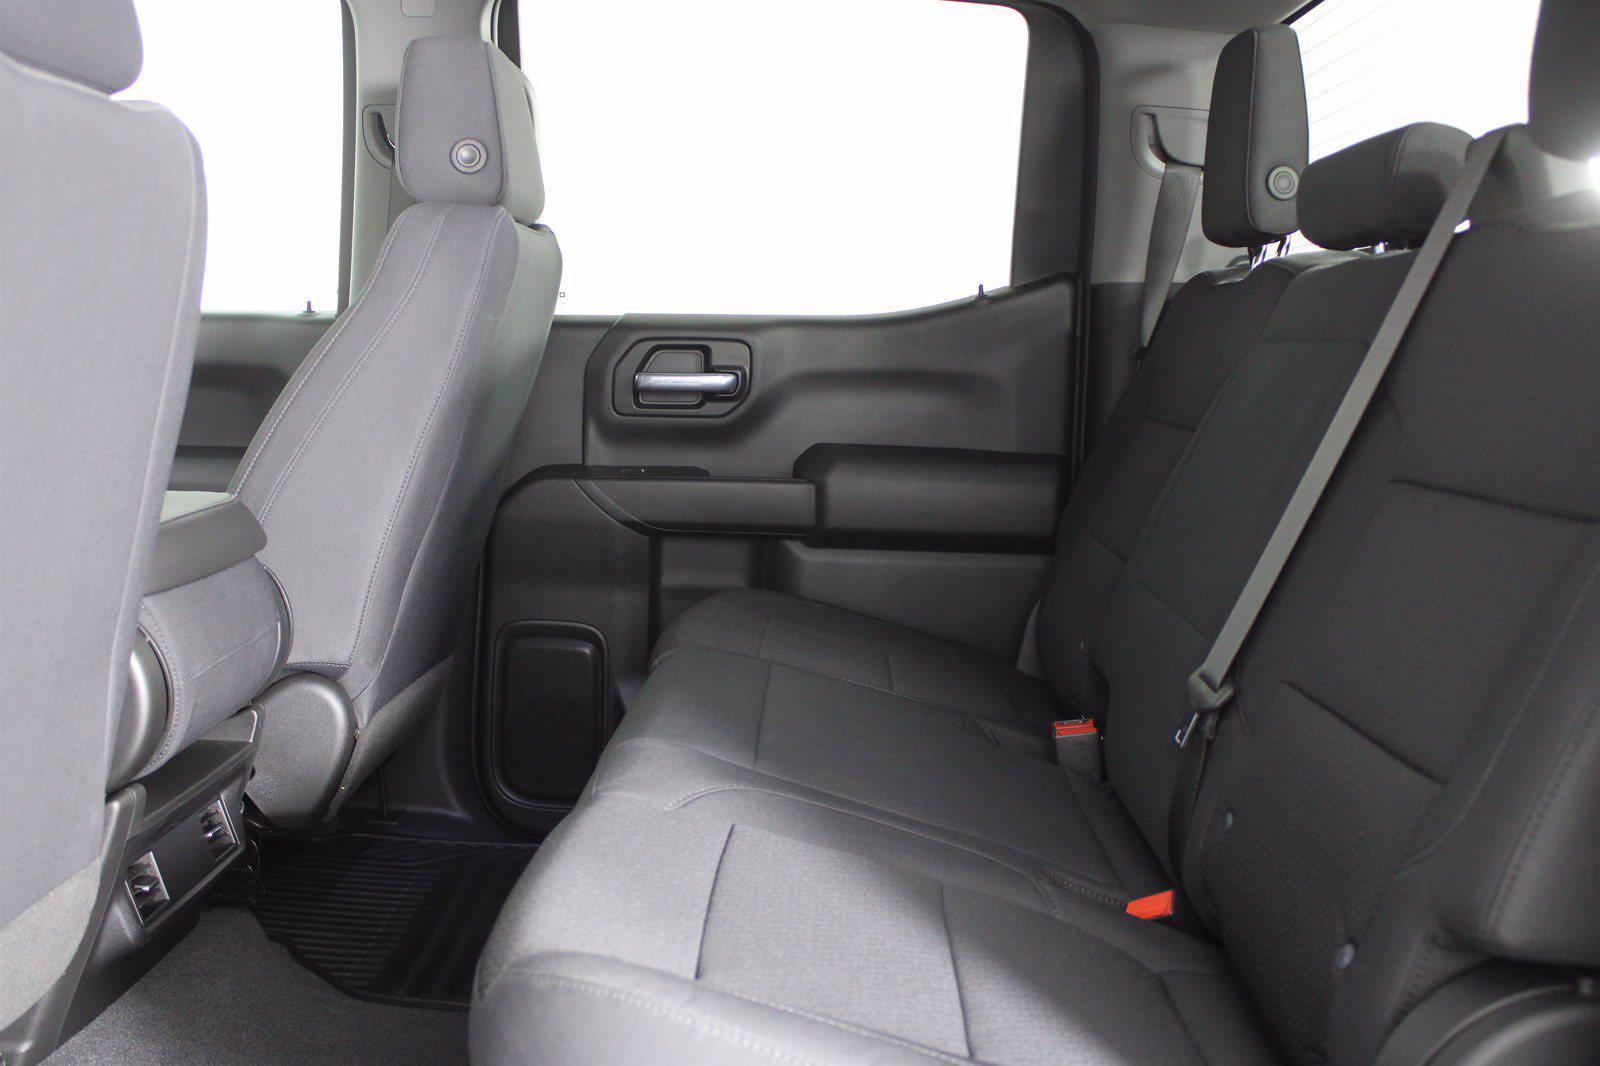 2020 Chevrolet Silverado 1500 Crew Cab 4x4, Pickup #DTC1713 - photo 8